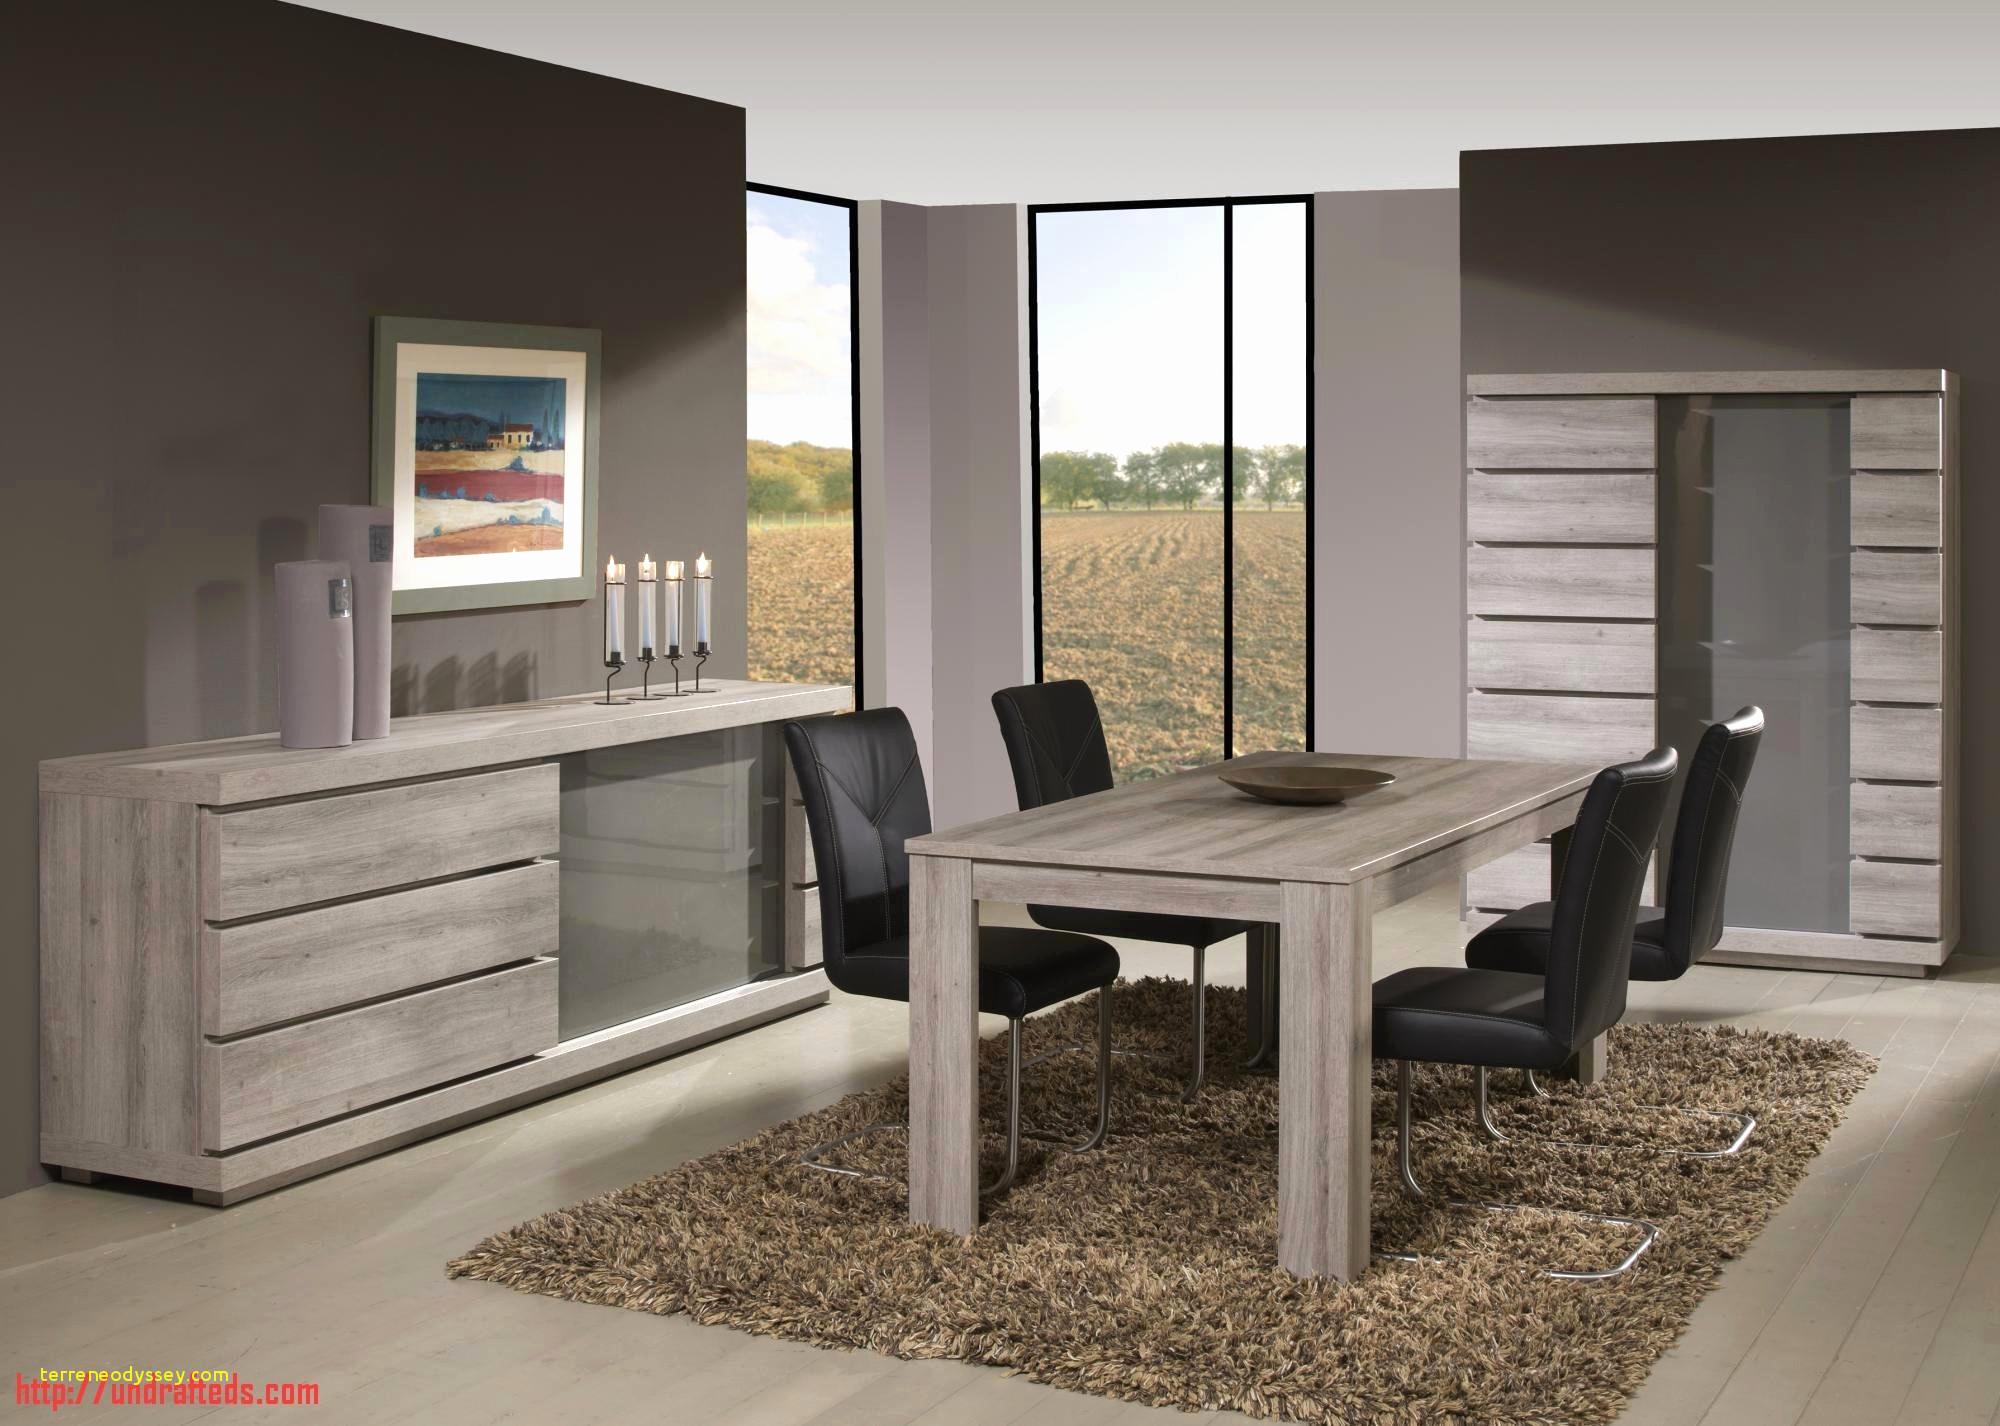 chaise salle a manger scandinave le meilleur de meuble conforama salle a manger chaise en bois conforama frais of chaise salle a manger scandinave